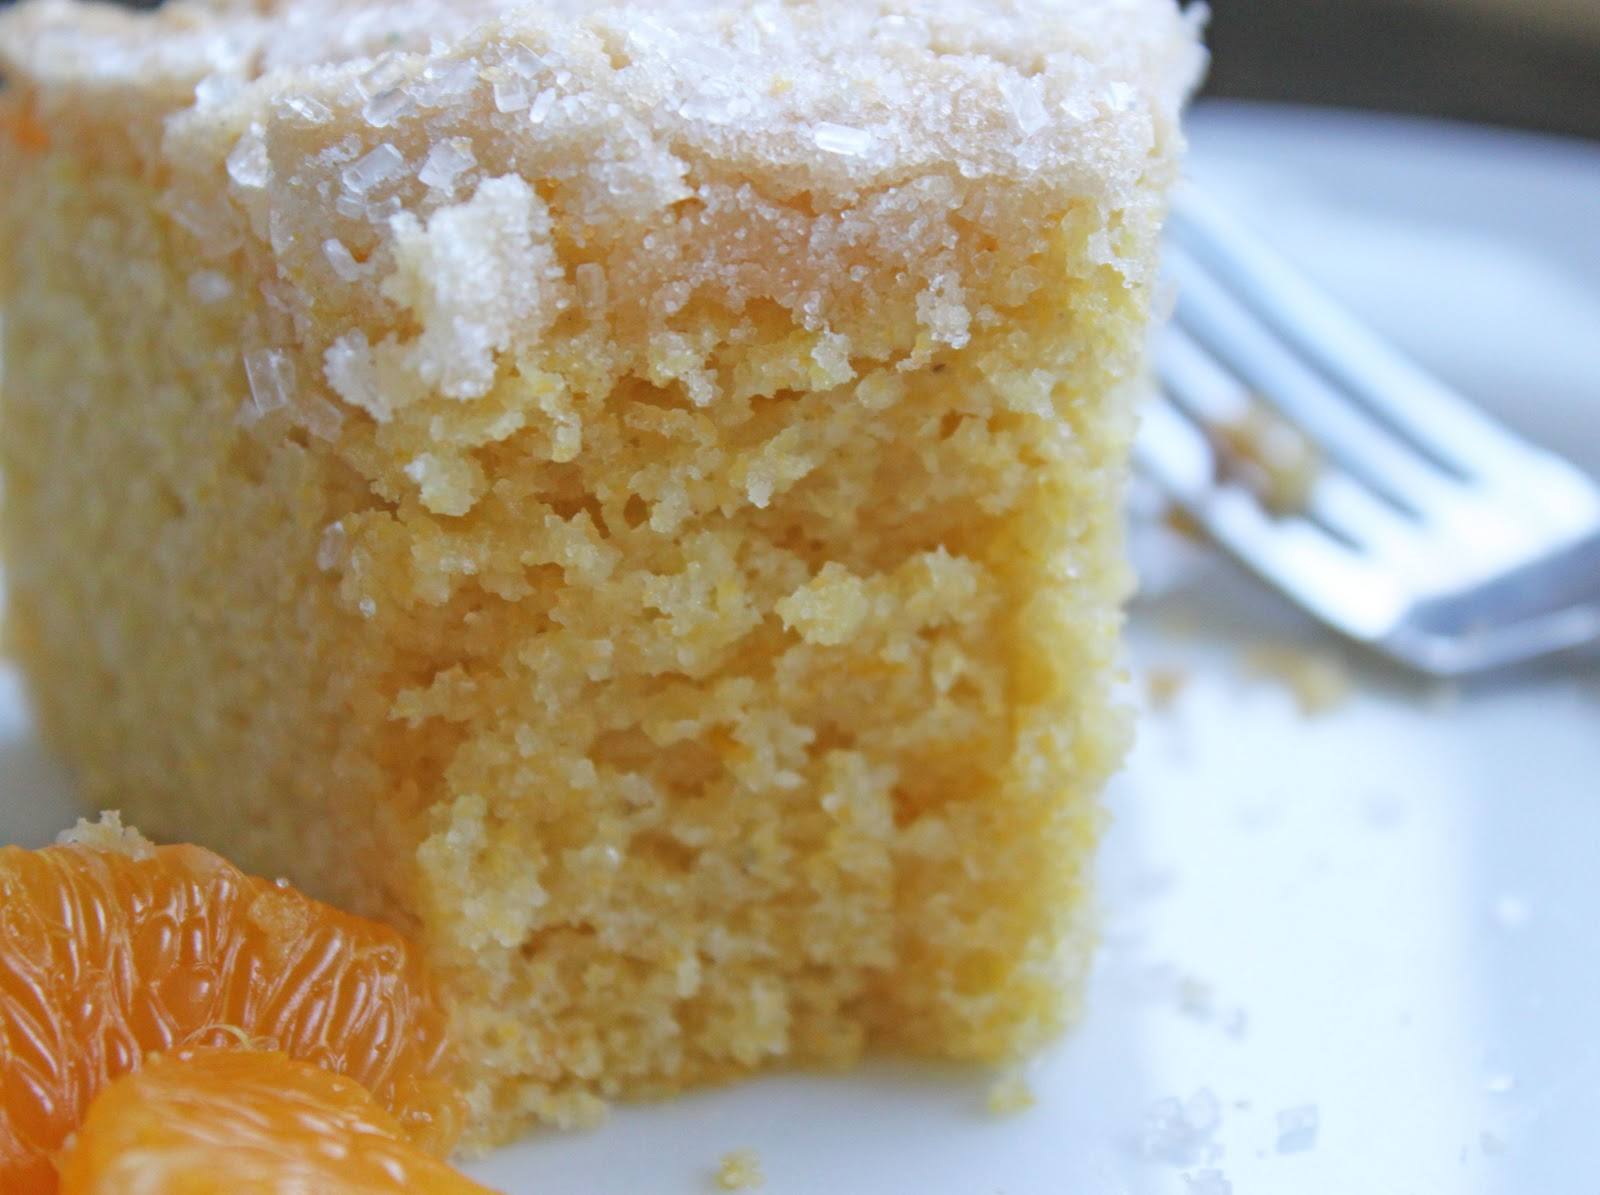 Mimi's Kitchen: Orange Cornmeal Cake